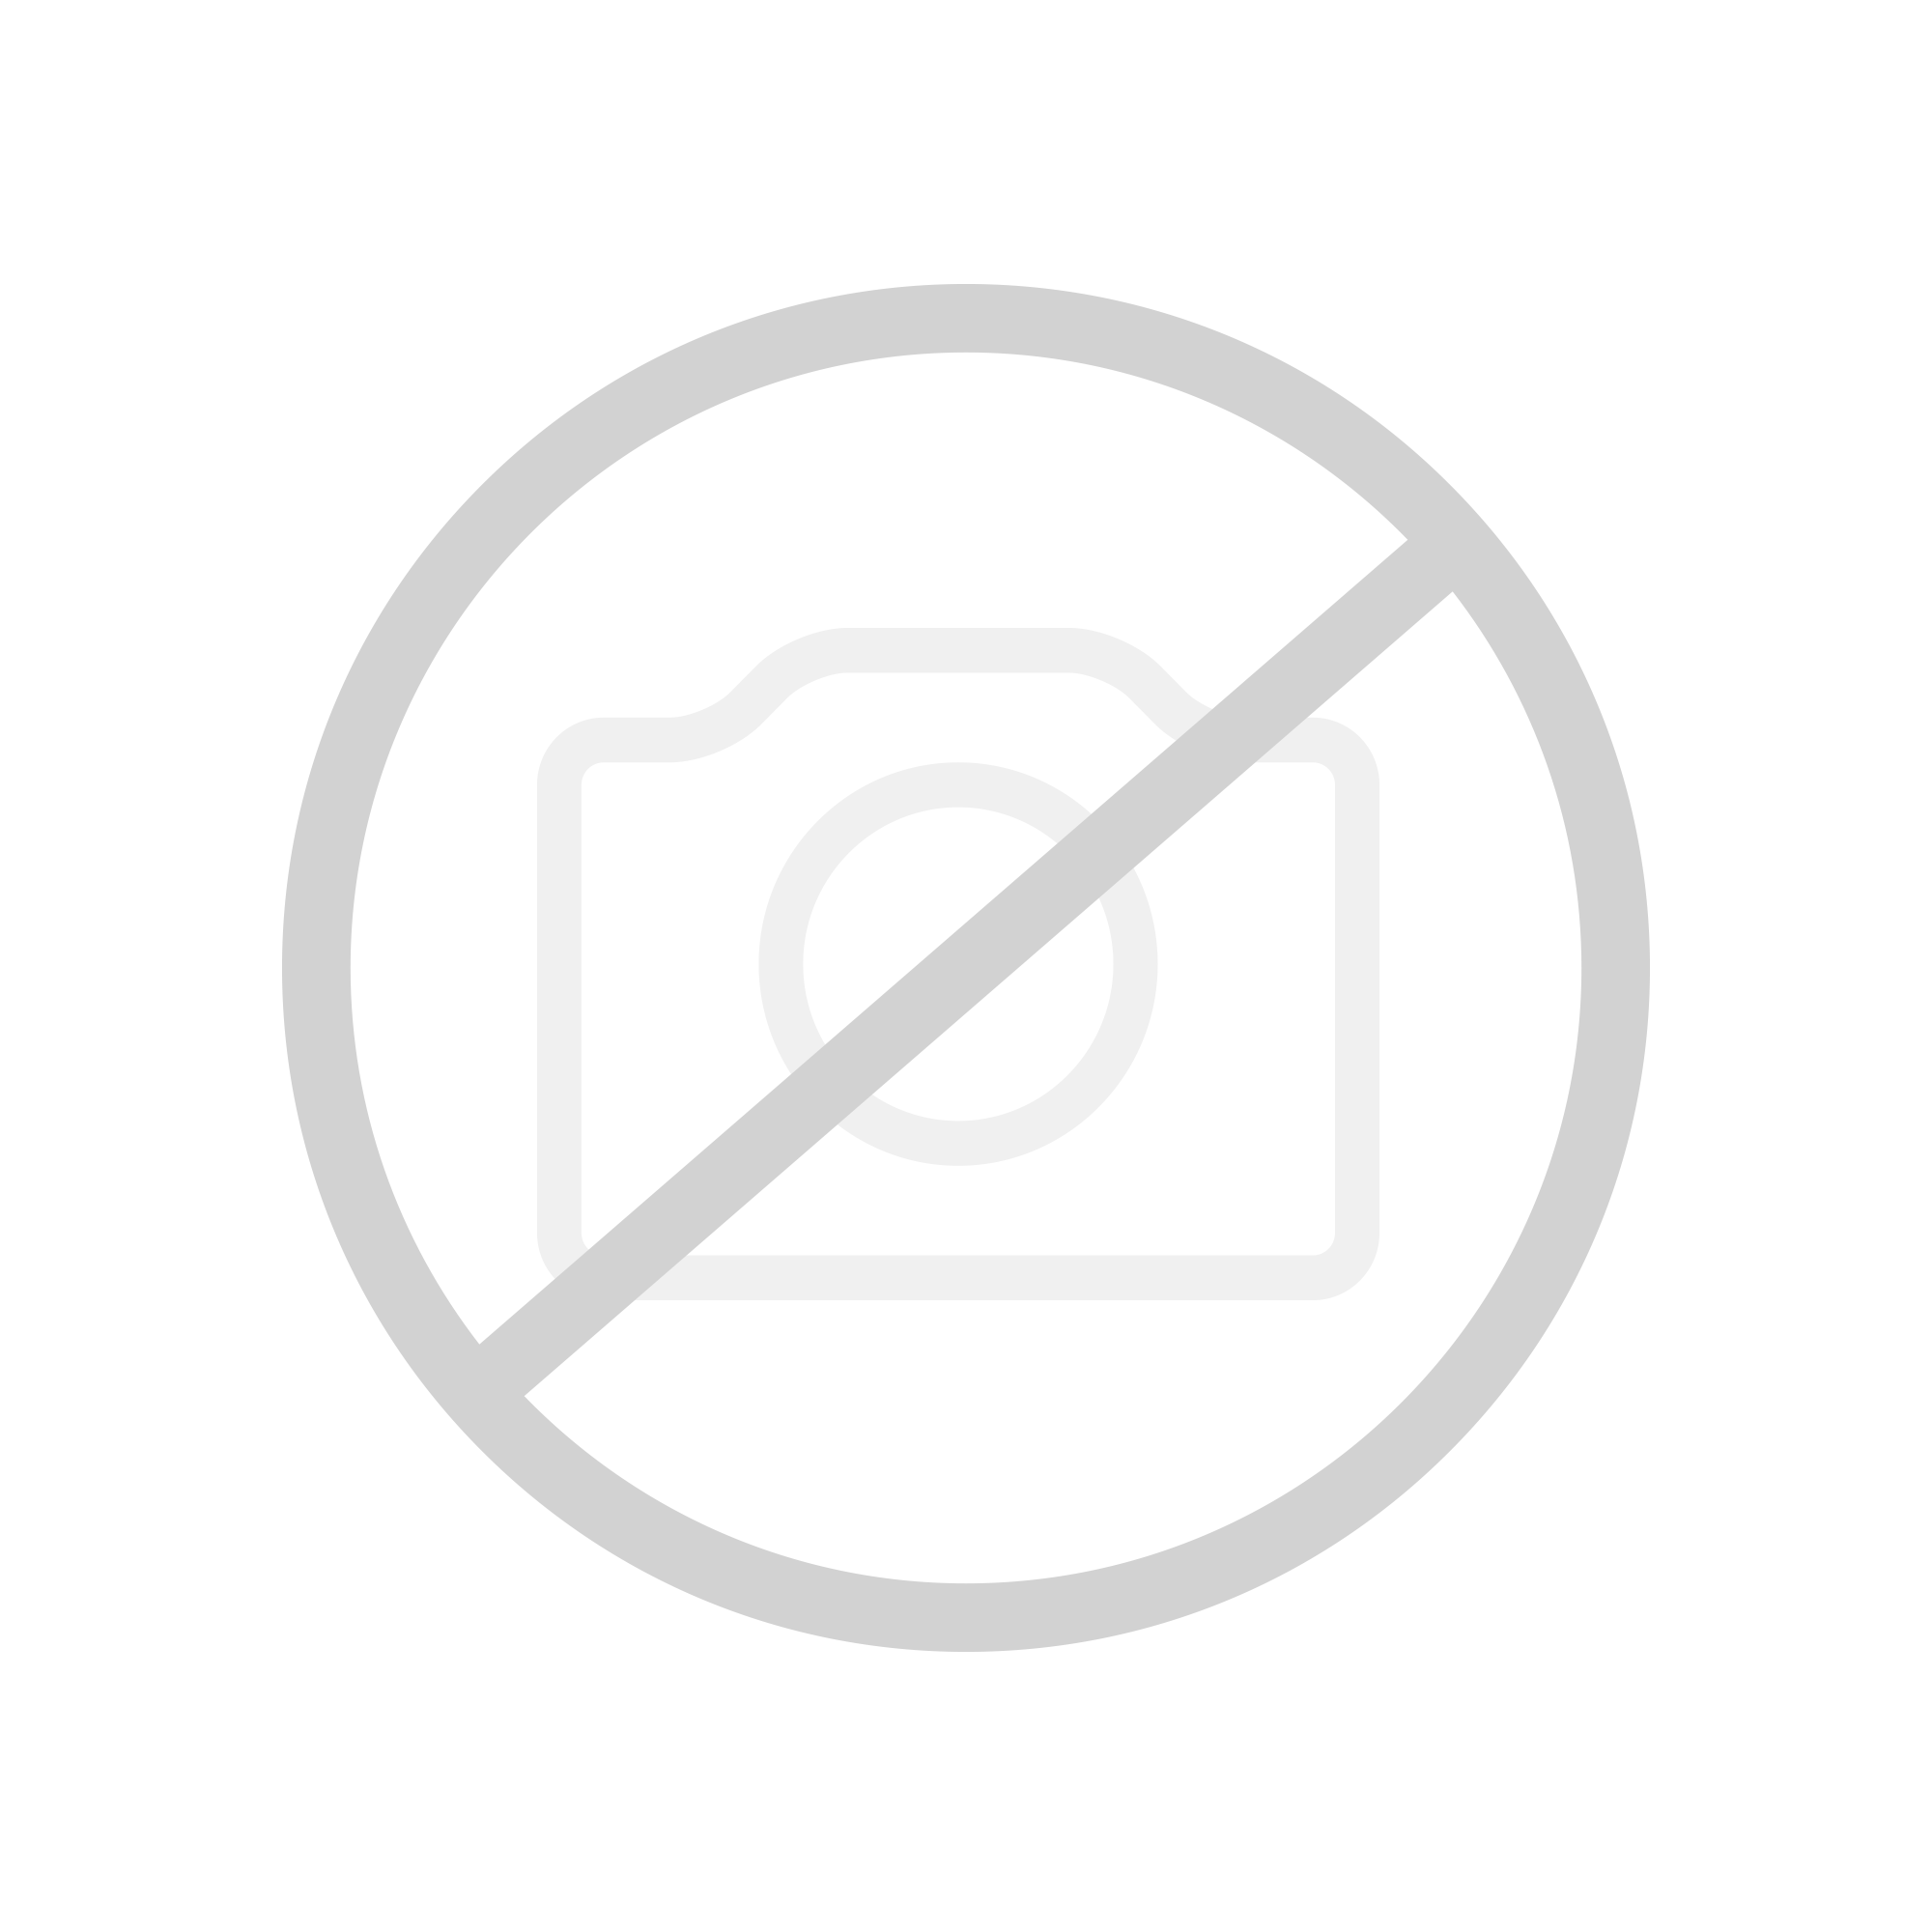 HSK K2 Gleittür mit Seitenwand klar hell / chrom optik